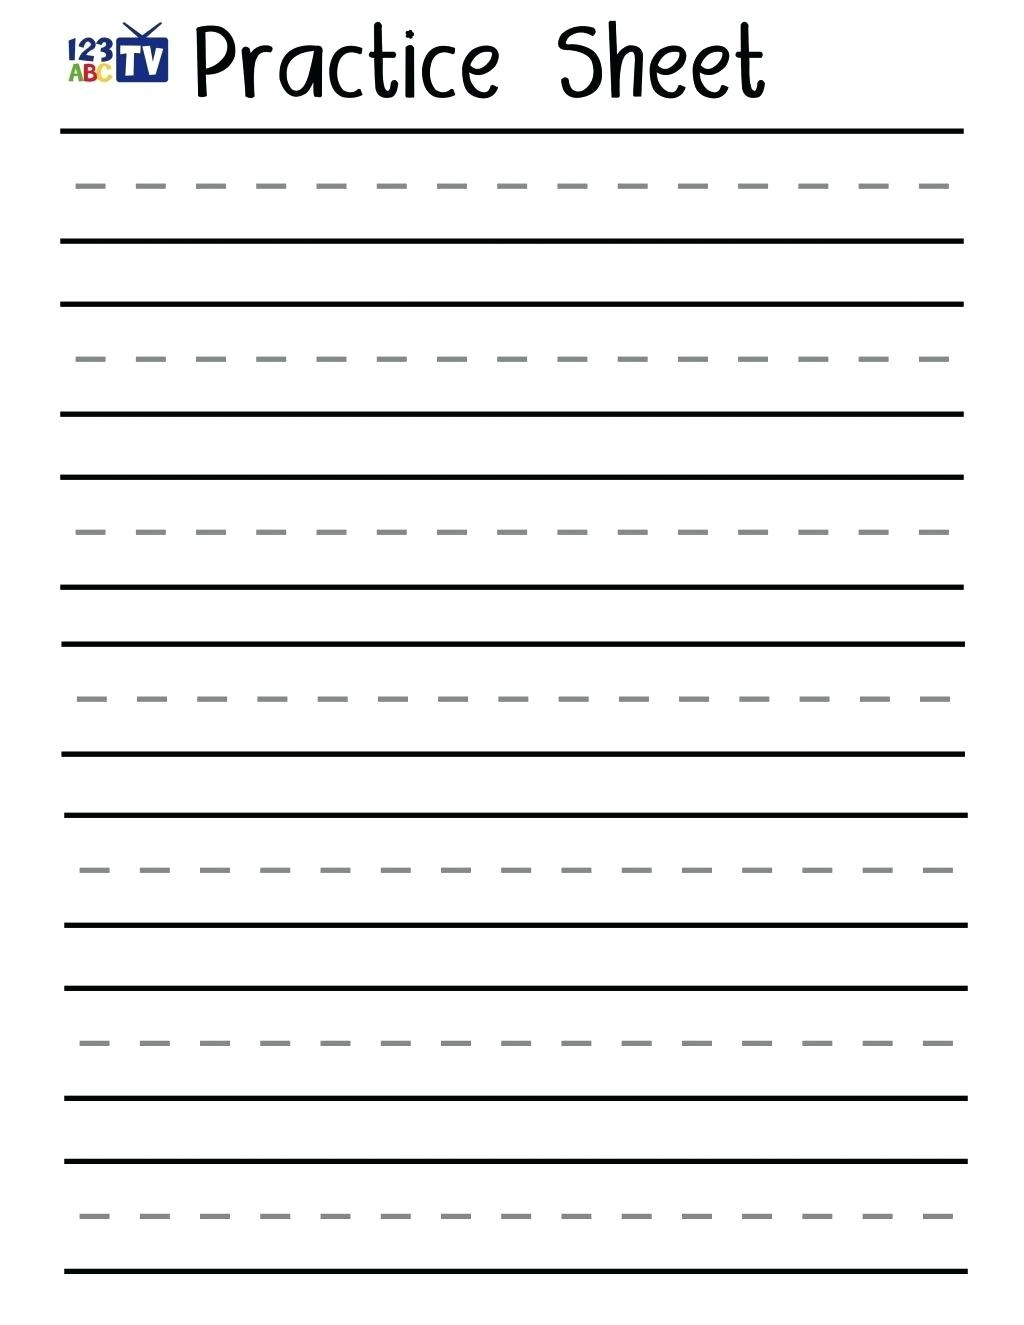 Practice Writing Sheets – Shoppingforu.club - Free Printable Writing Sheets